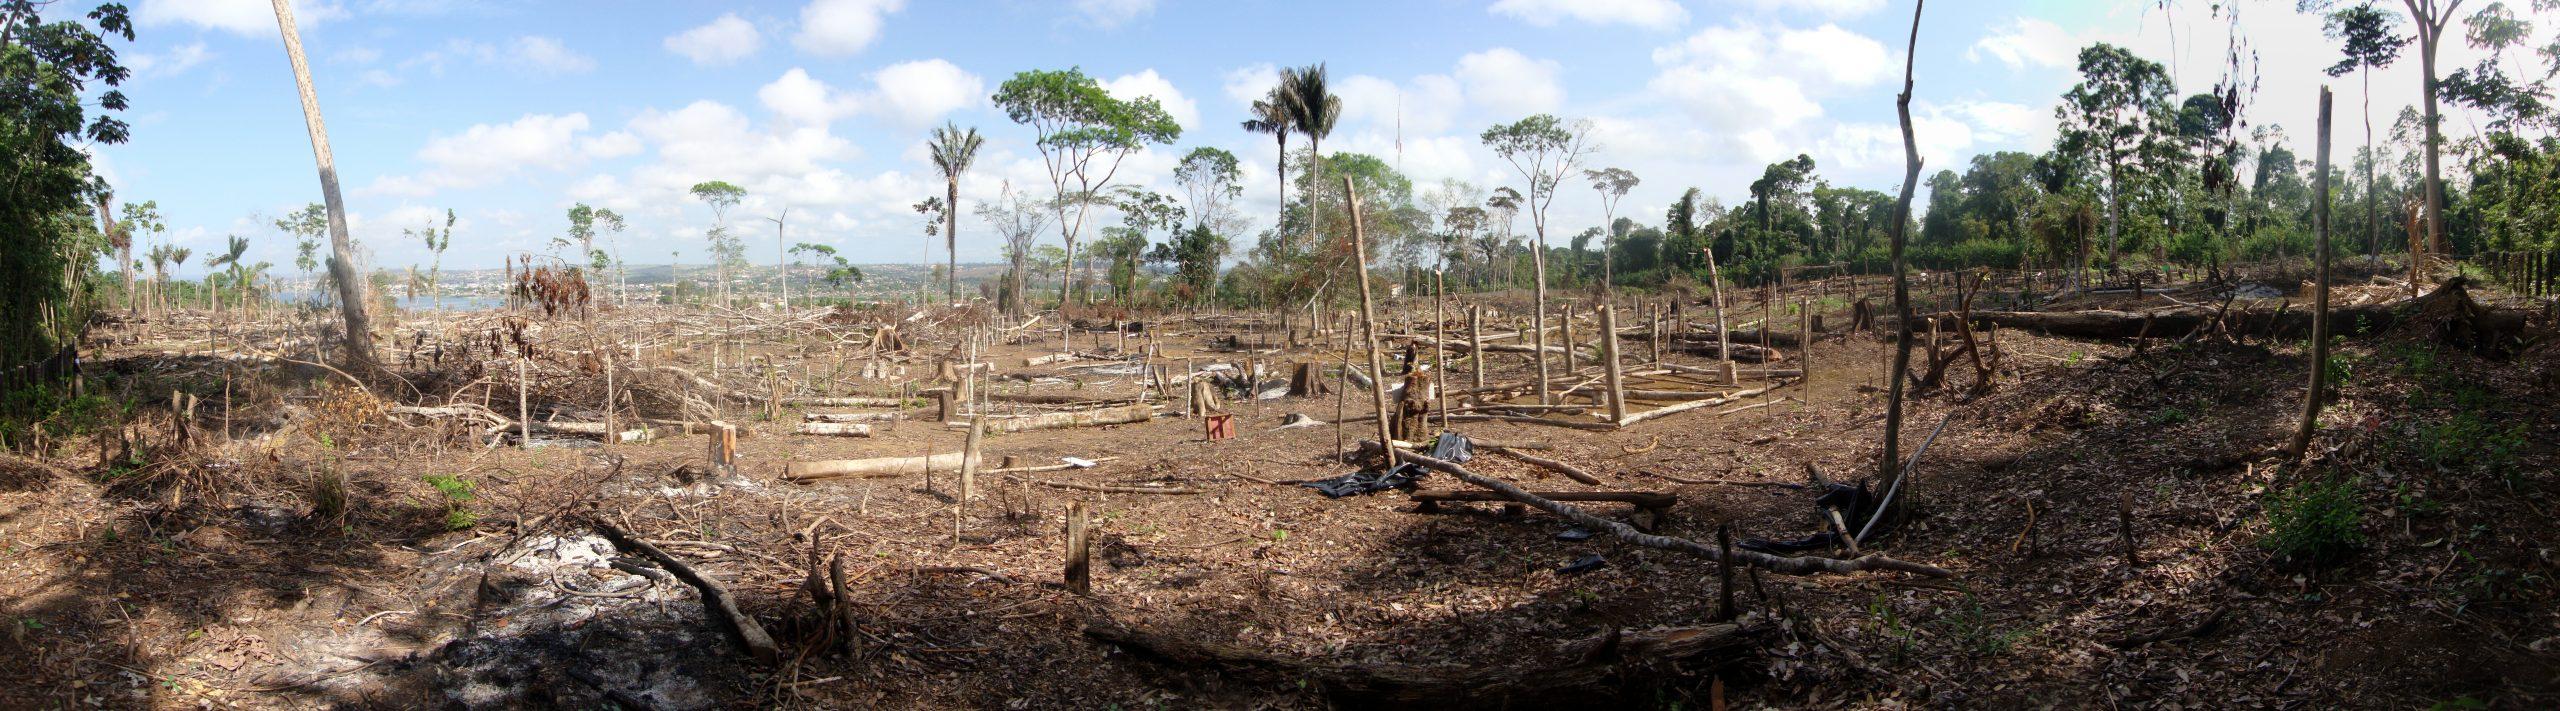 Abholzung im Amazonas - zerstörter Regenwald